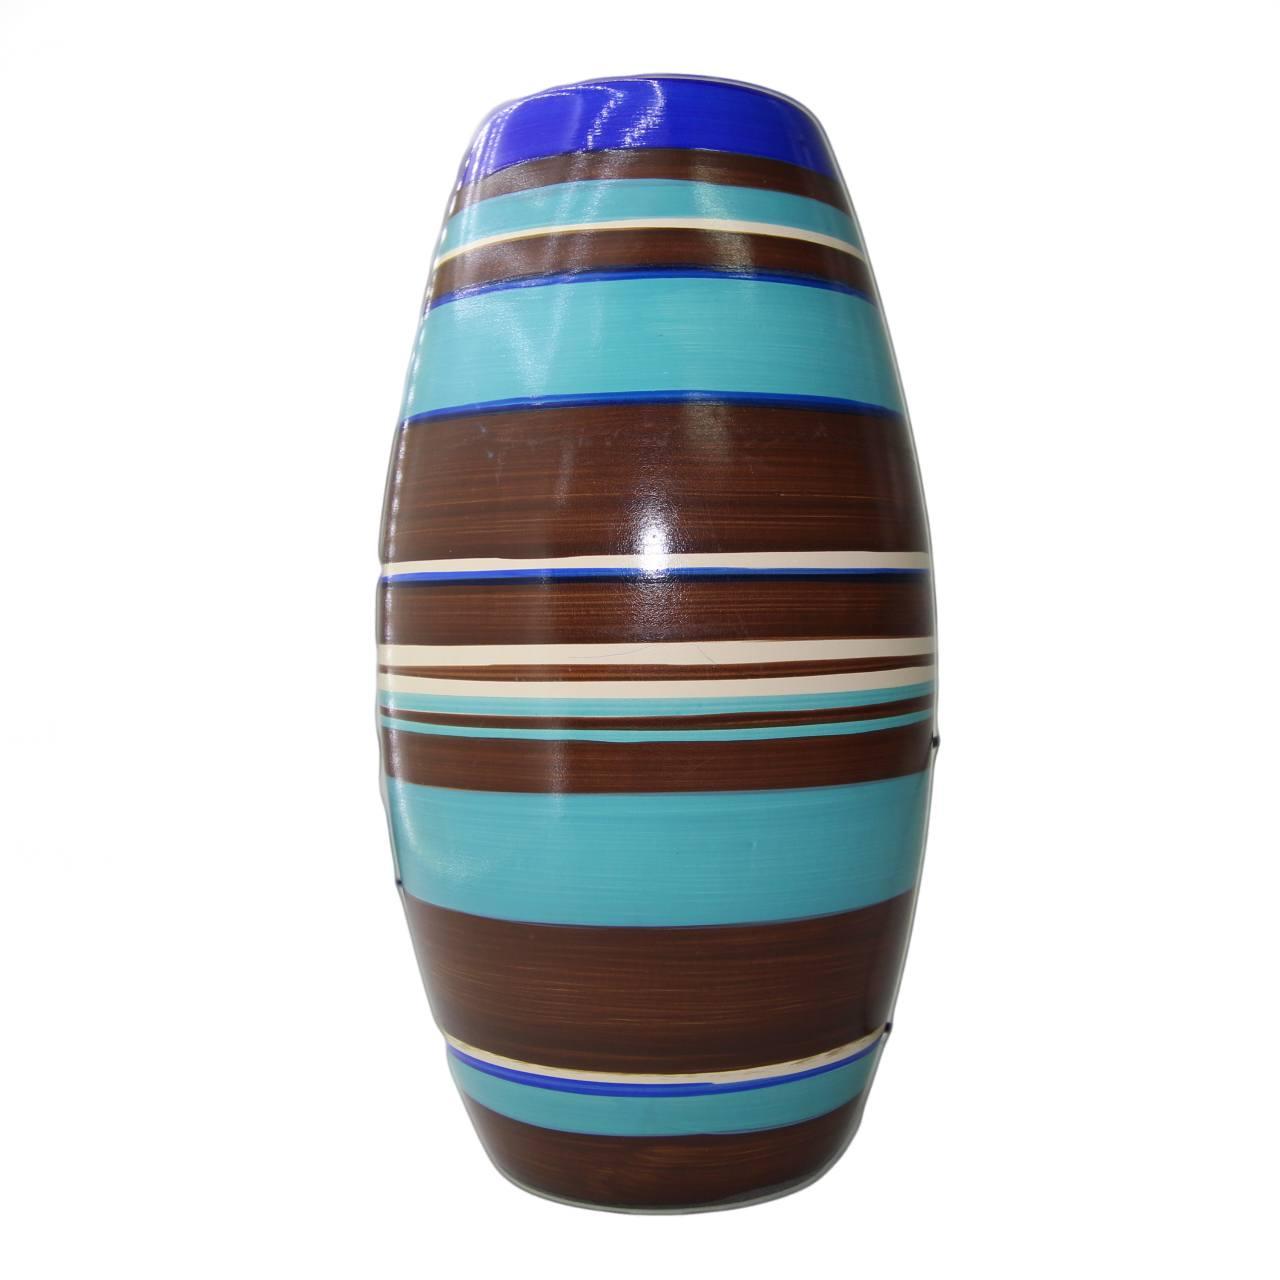 Vaso Love Stripes médio marrom/azul 15x28 cm Monte Real